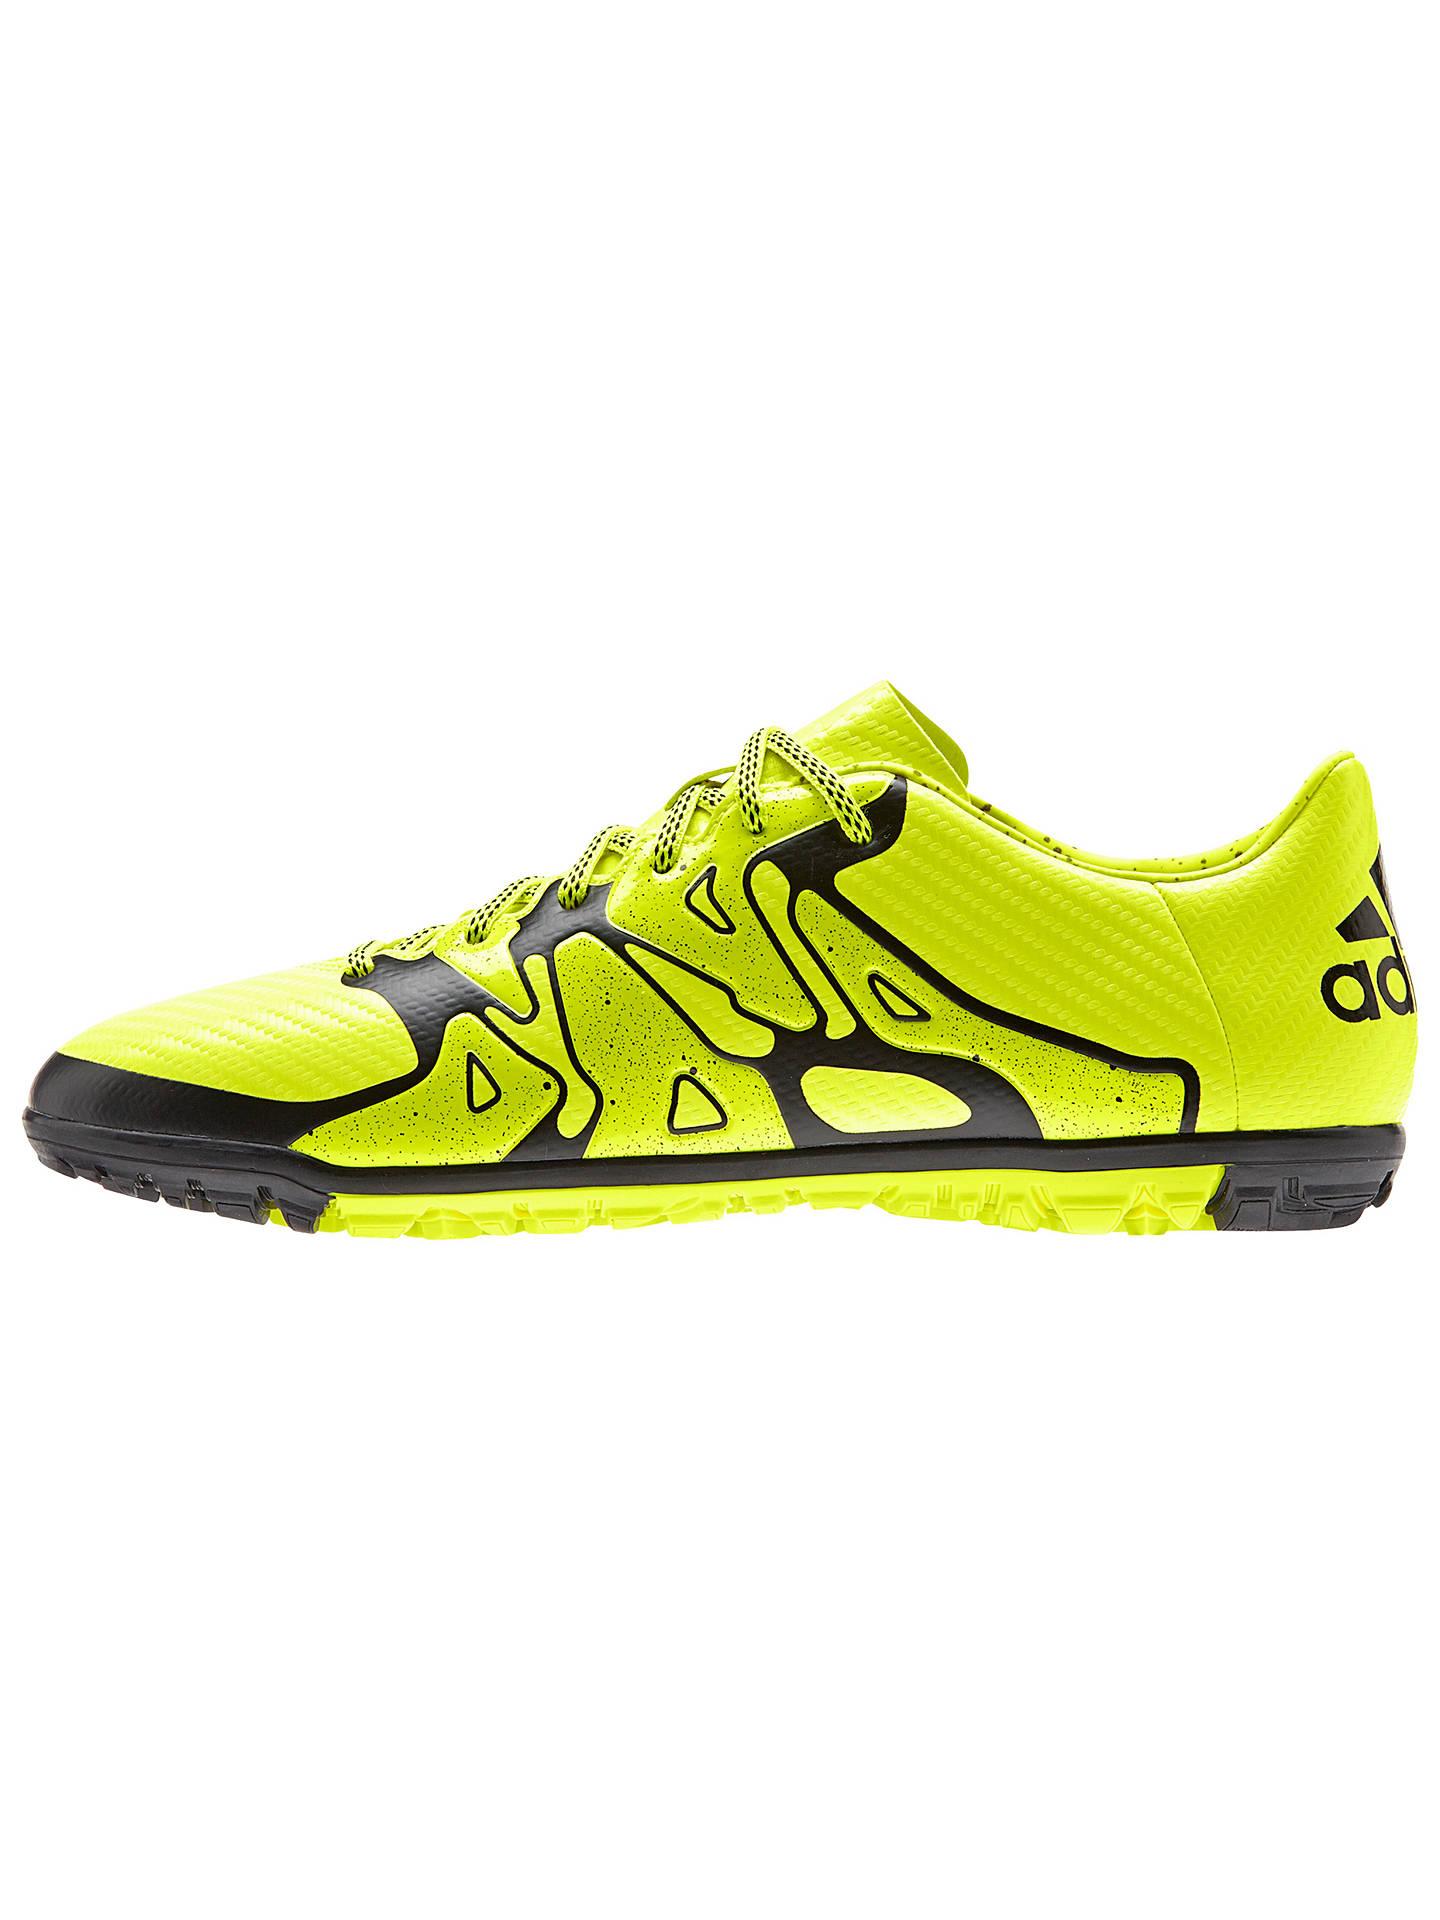 3e73fd698596 Buy Adidas X15.3 TF FG Football Shoes